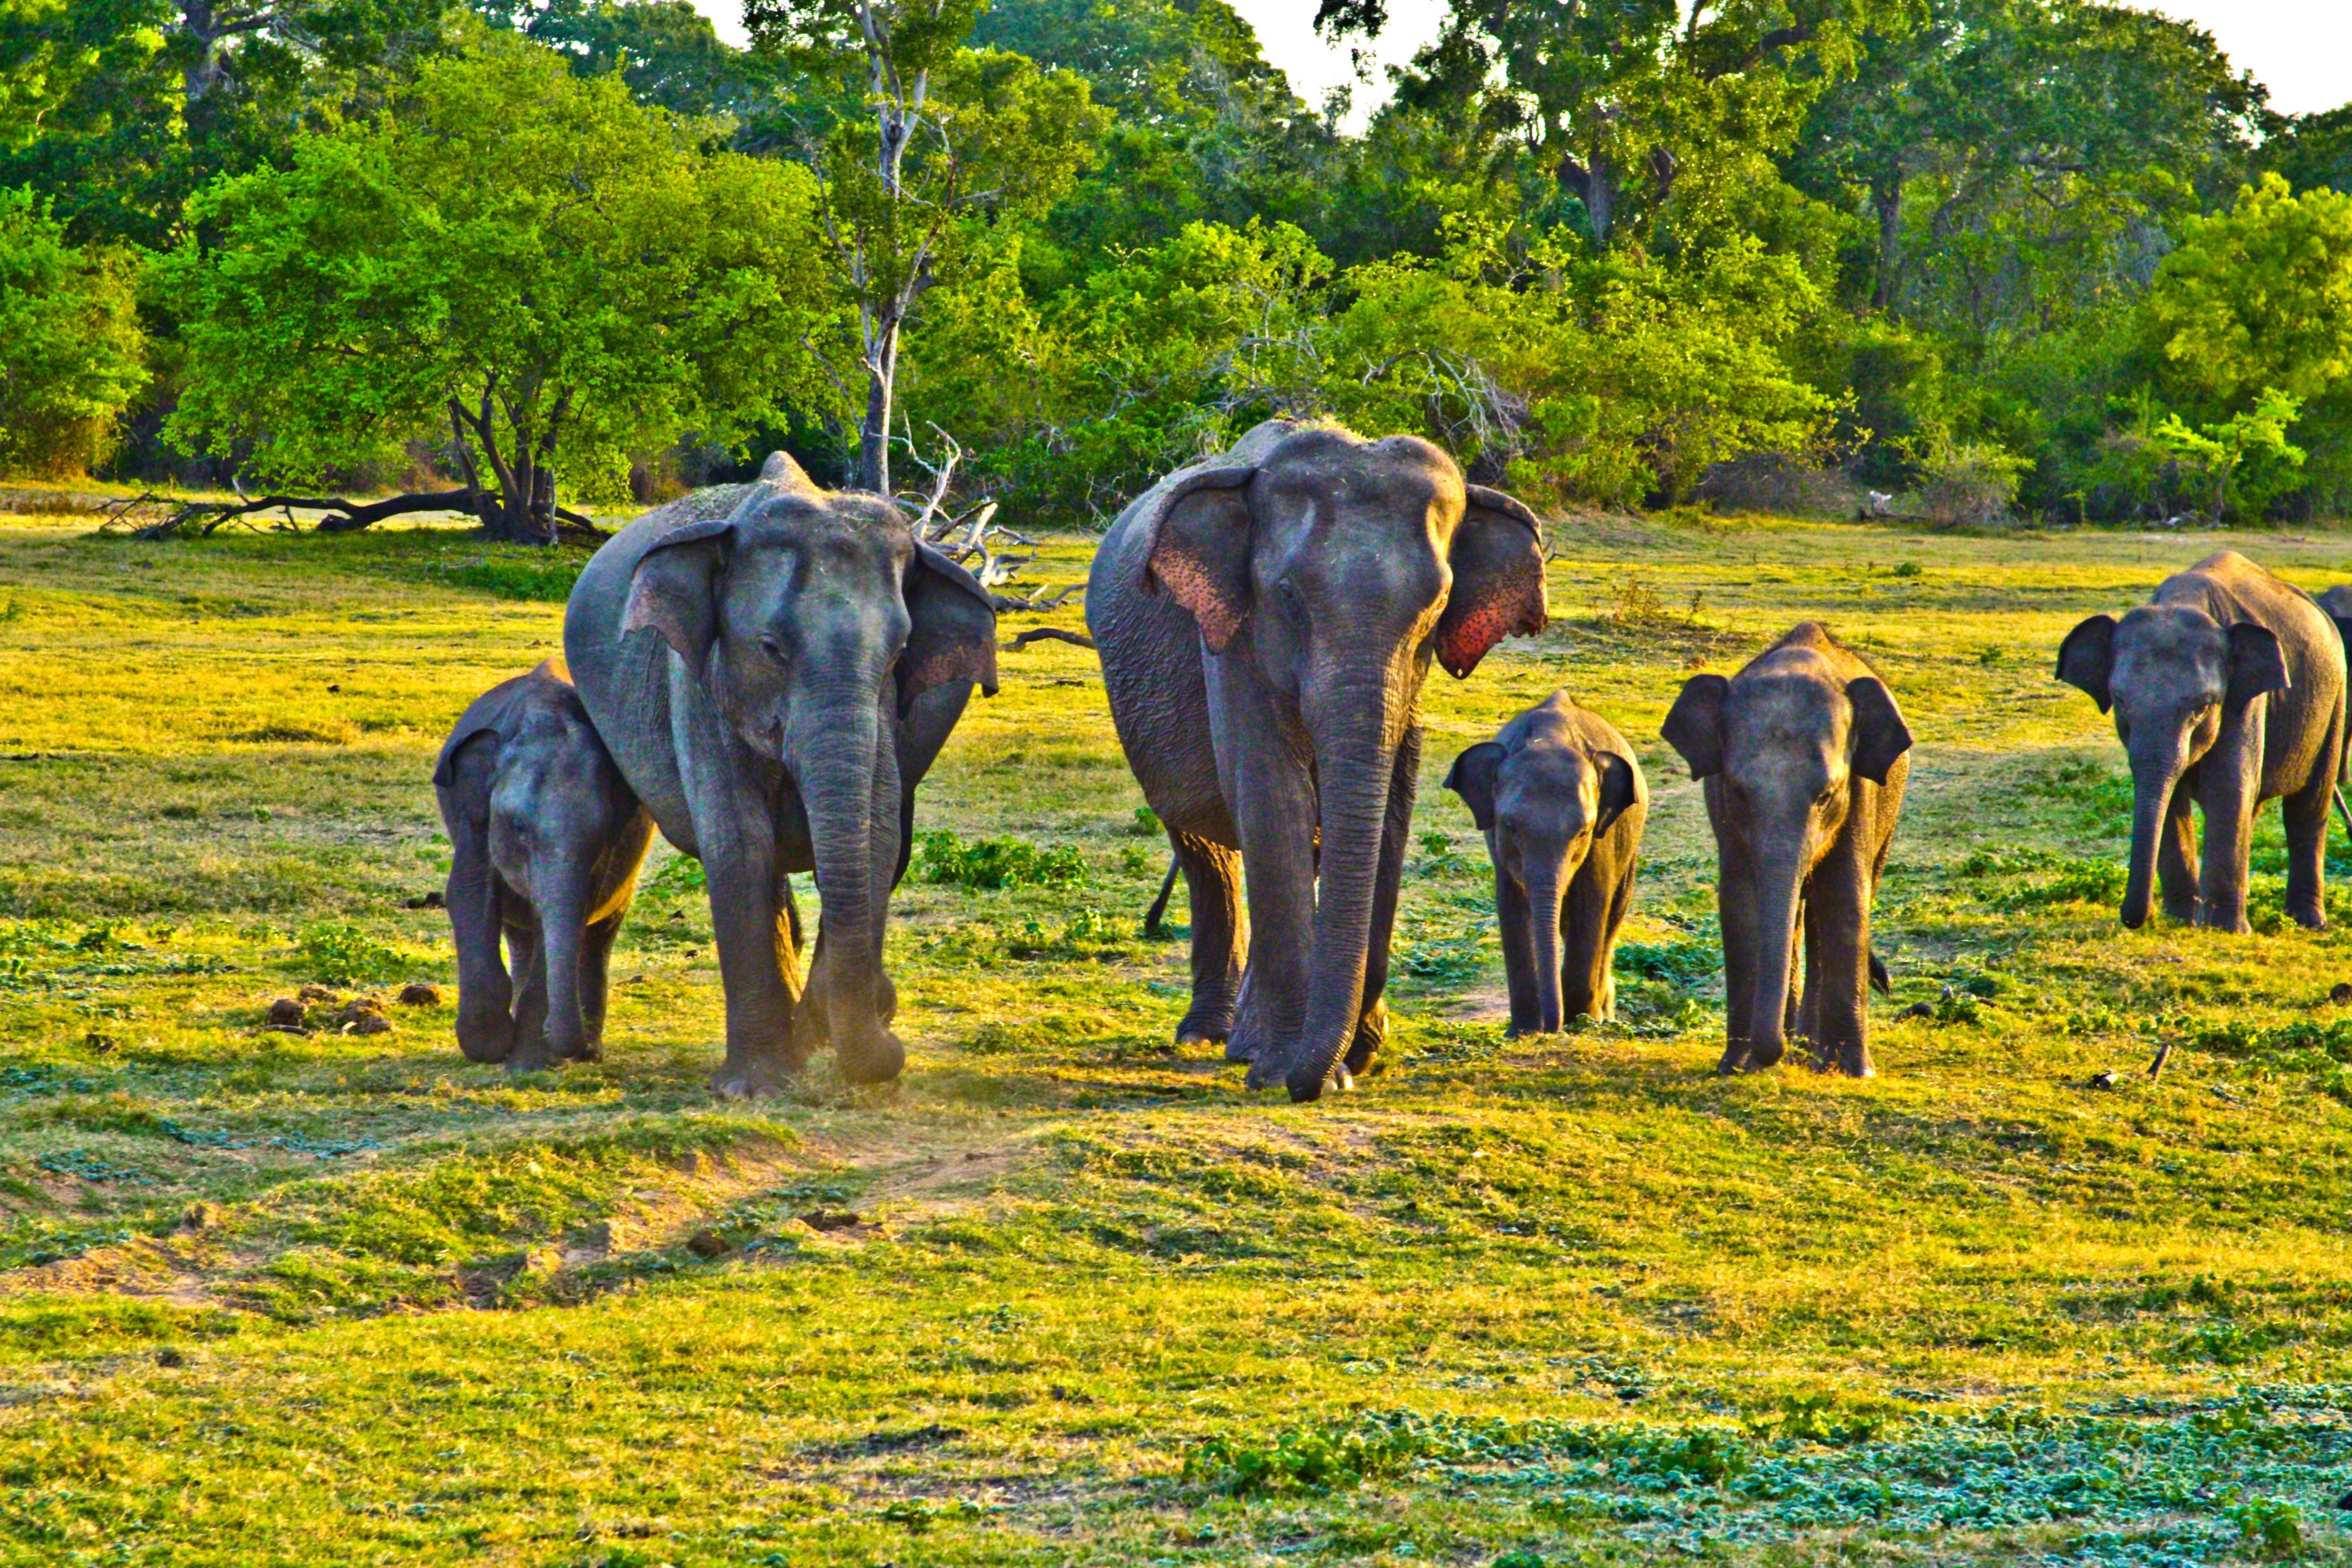 Sri Lankan elephants in late afternoon